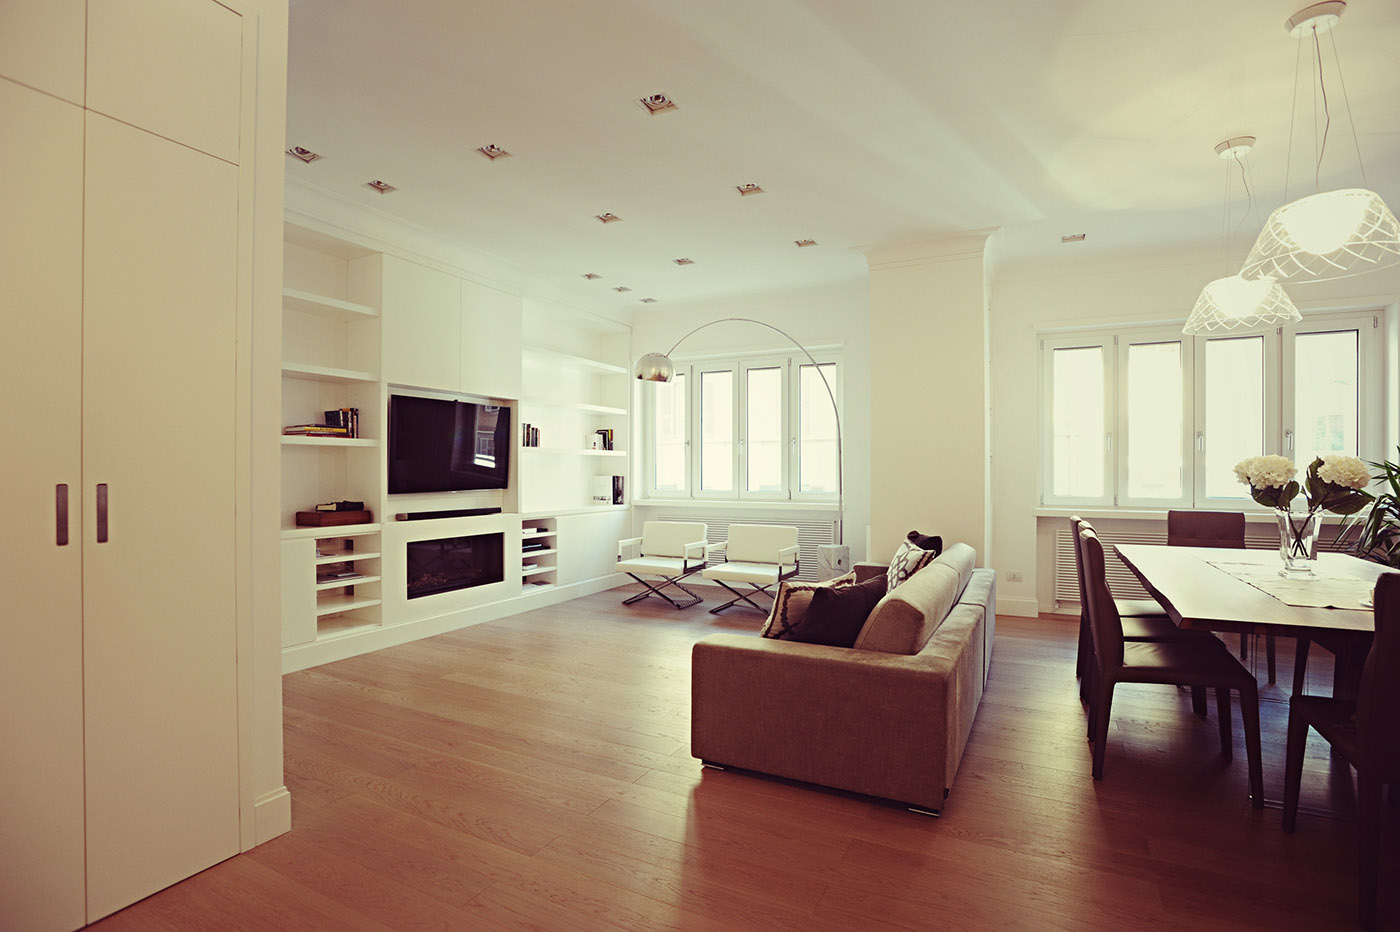 Interior design appartament in rome on behance for Roman interior designs